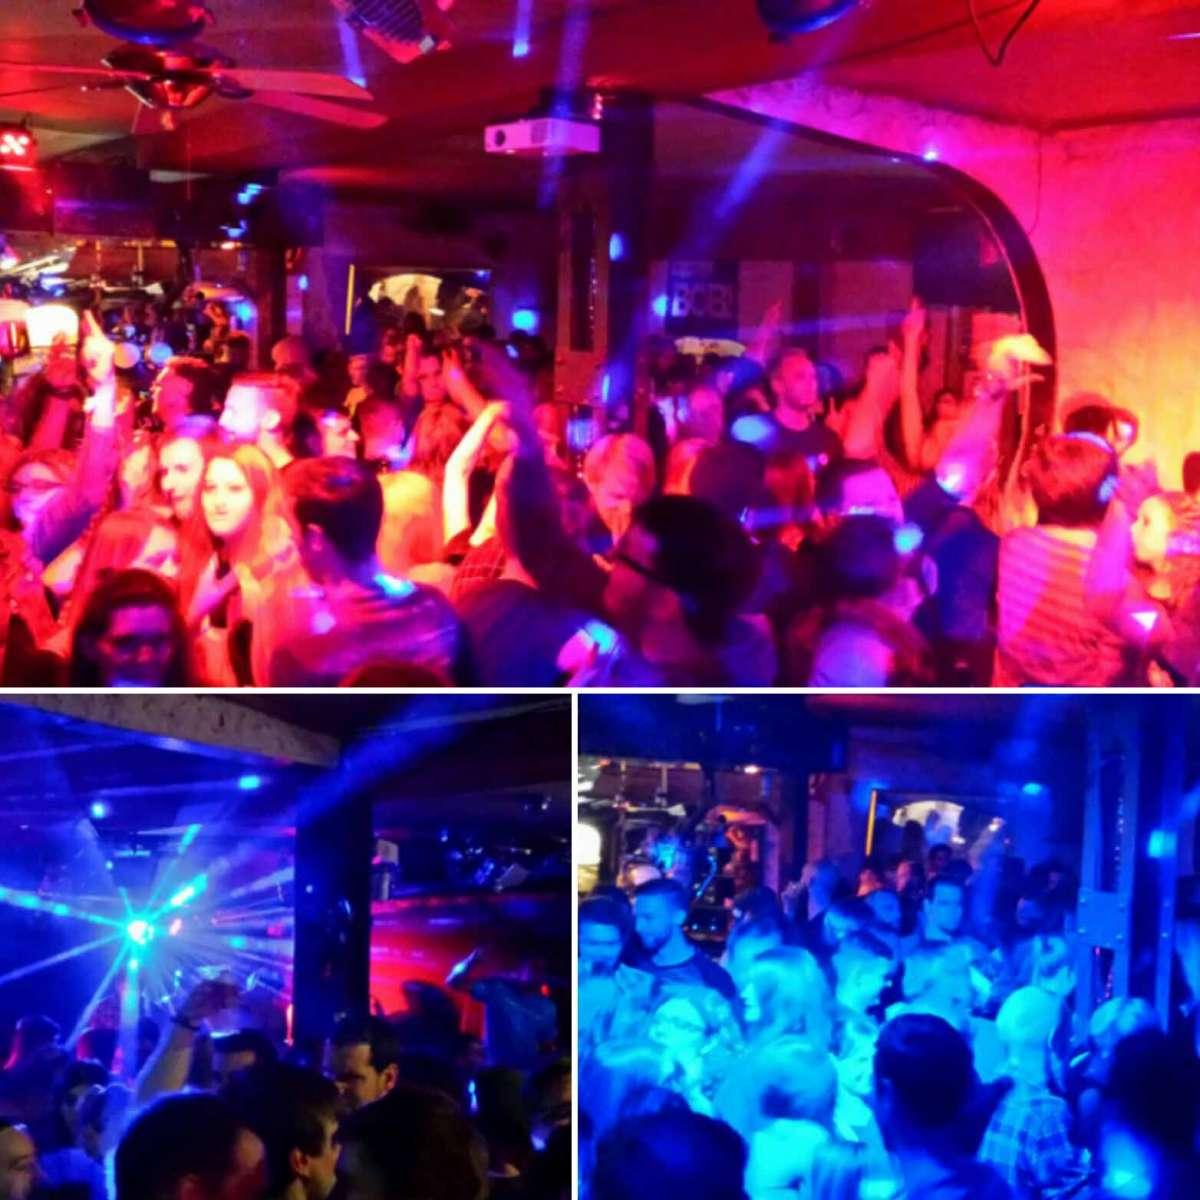 ABGESAGT! - Select Party #63 - DJ '59 Sound - Fiasko - Kassel